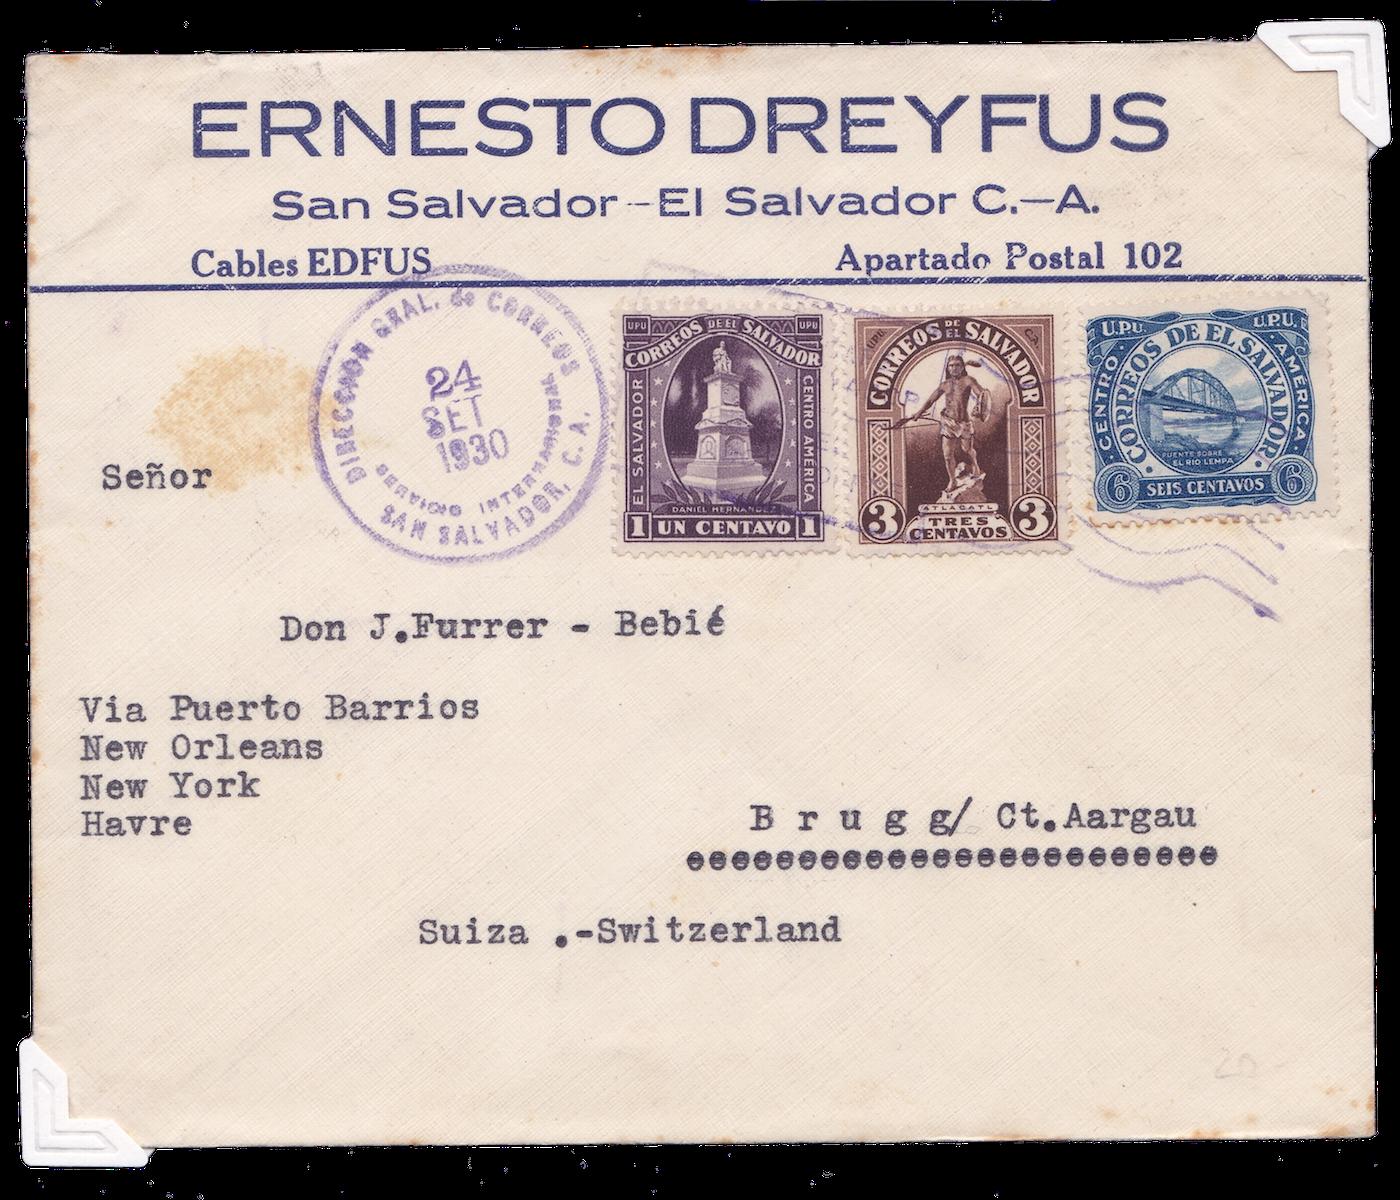 1930 | Ernesto Dreyfus